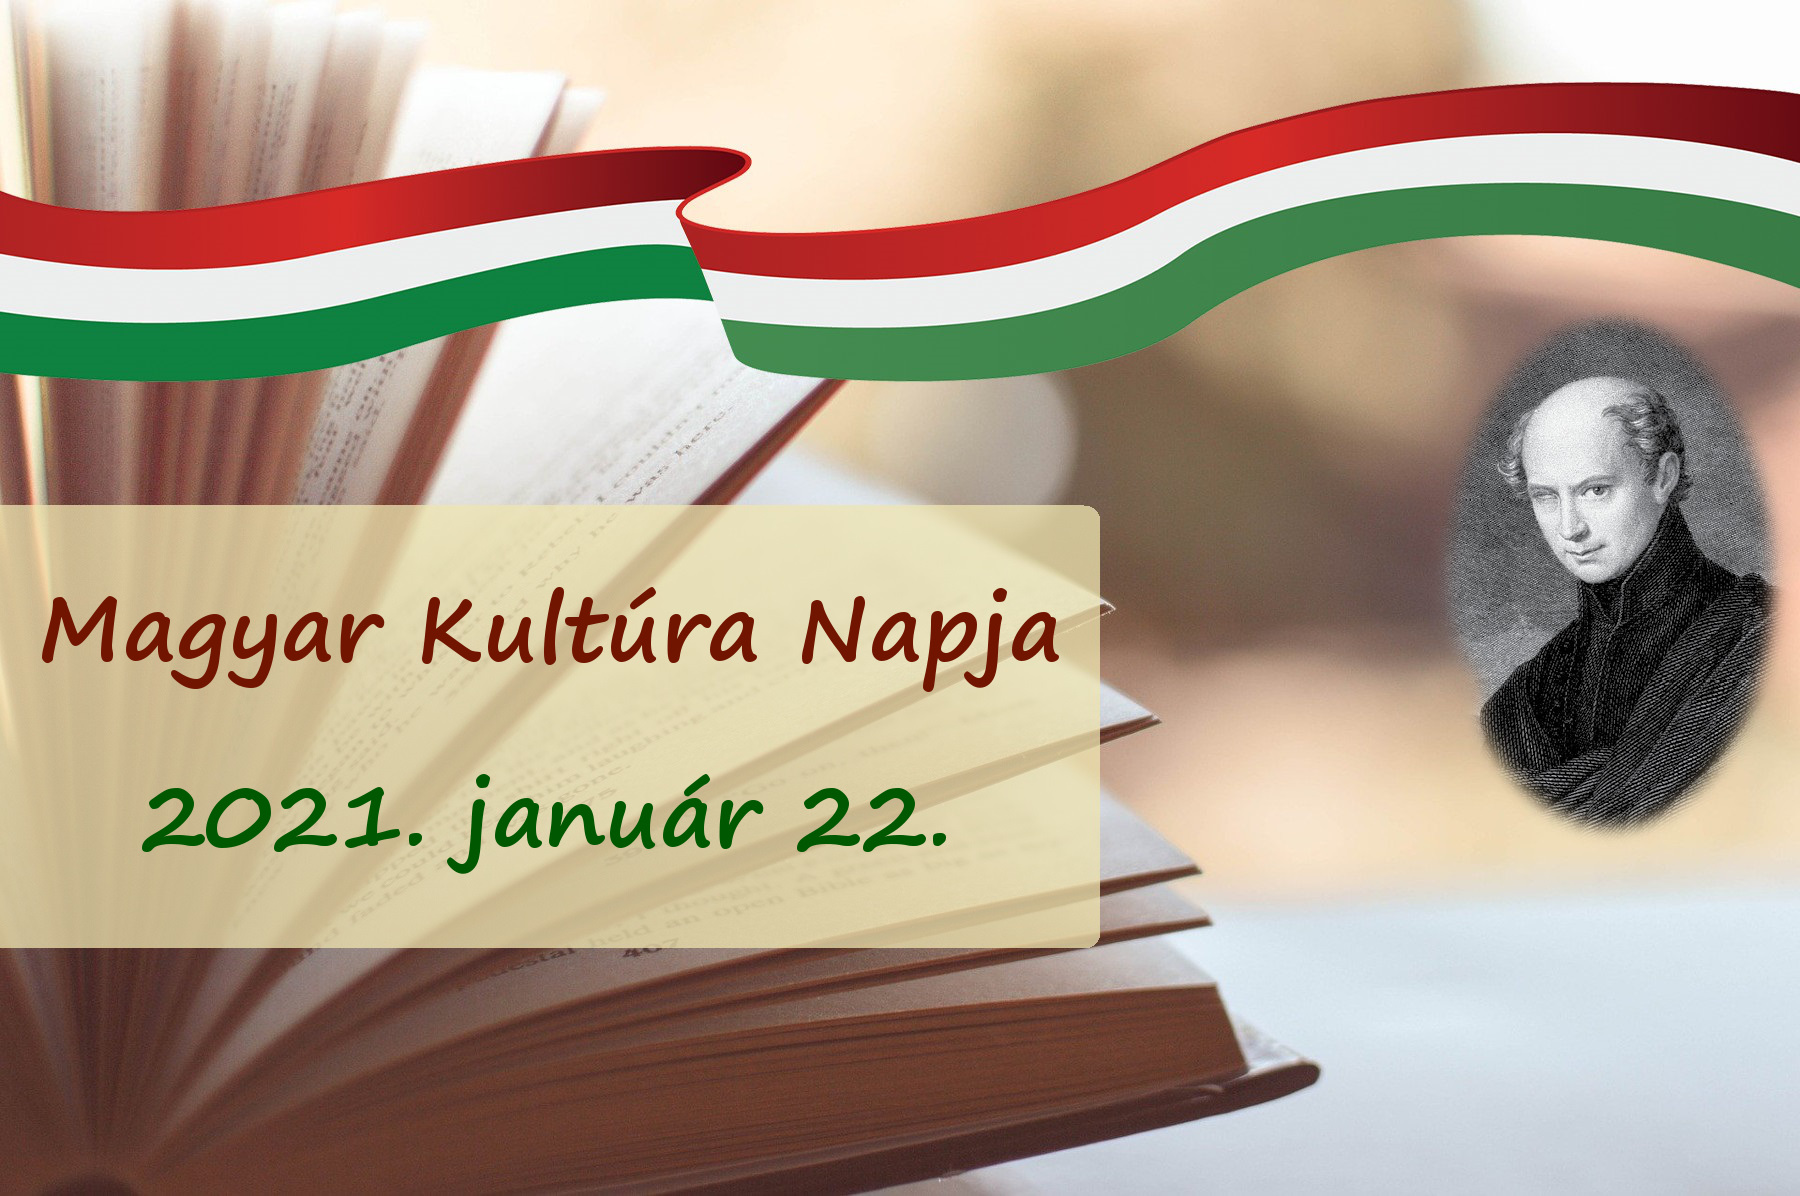 magyar-kultura-napja.jpg